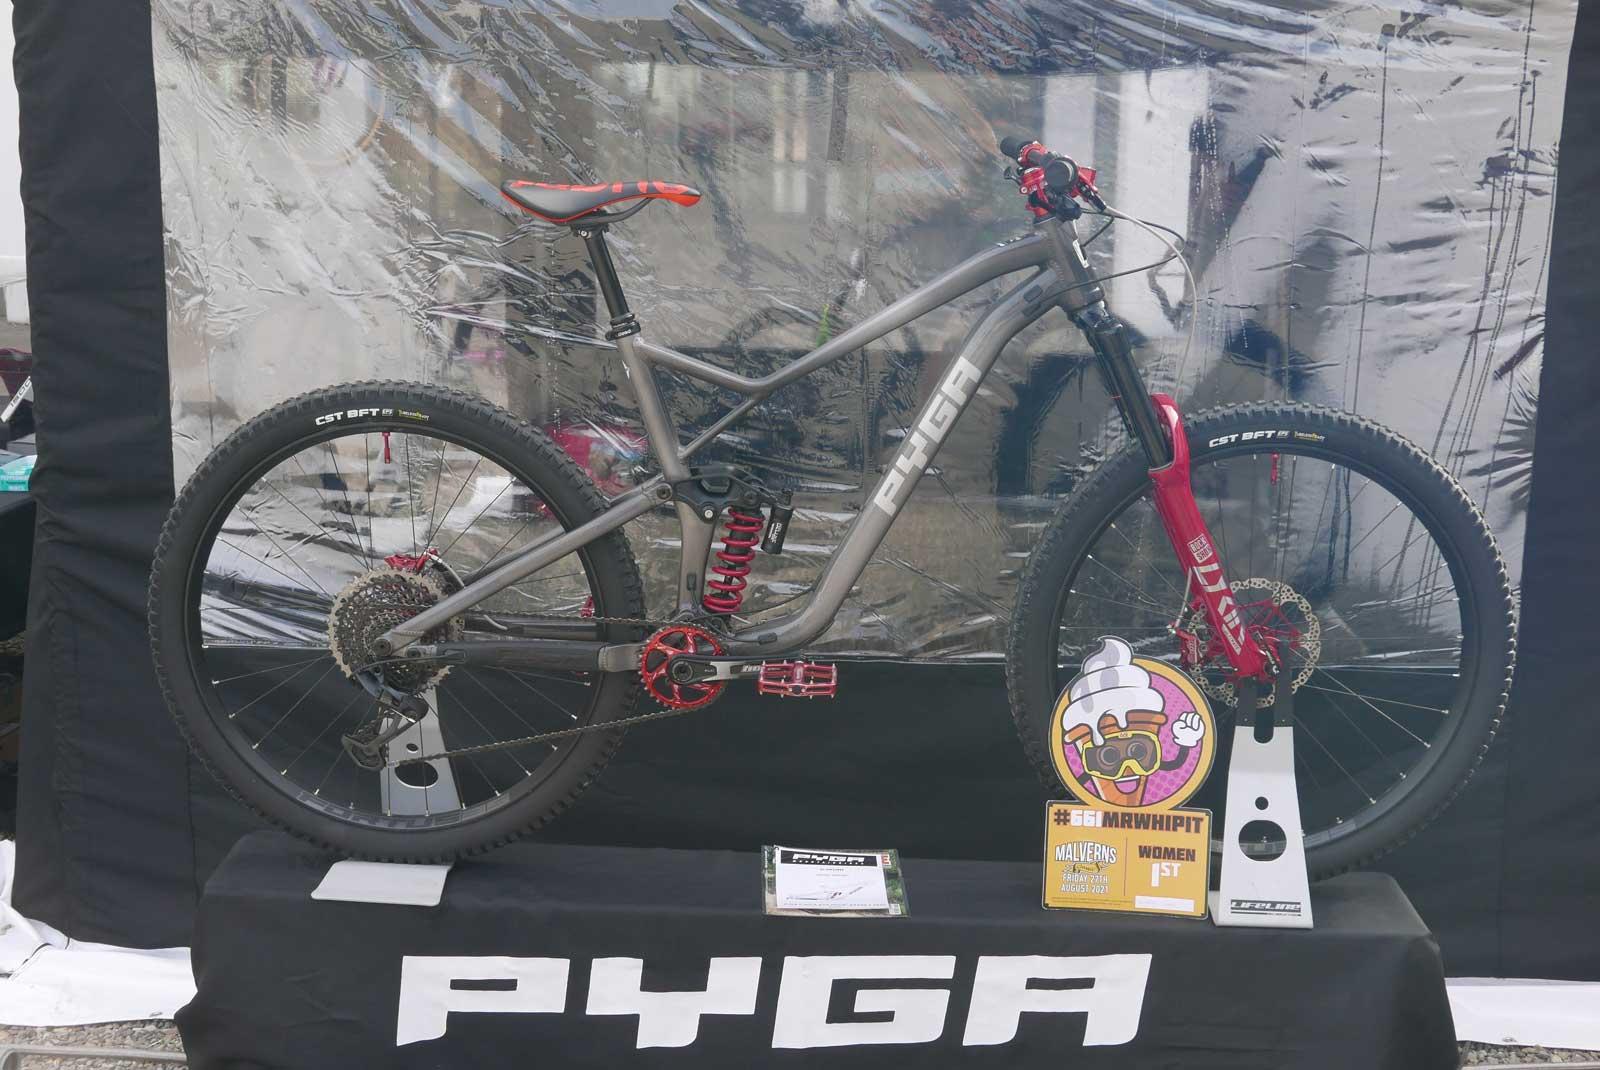 pyga slackline 160mm travel enduro mtb alluminium frame made in south africa